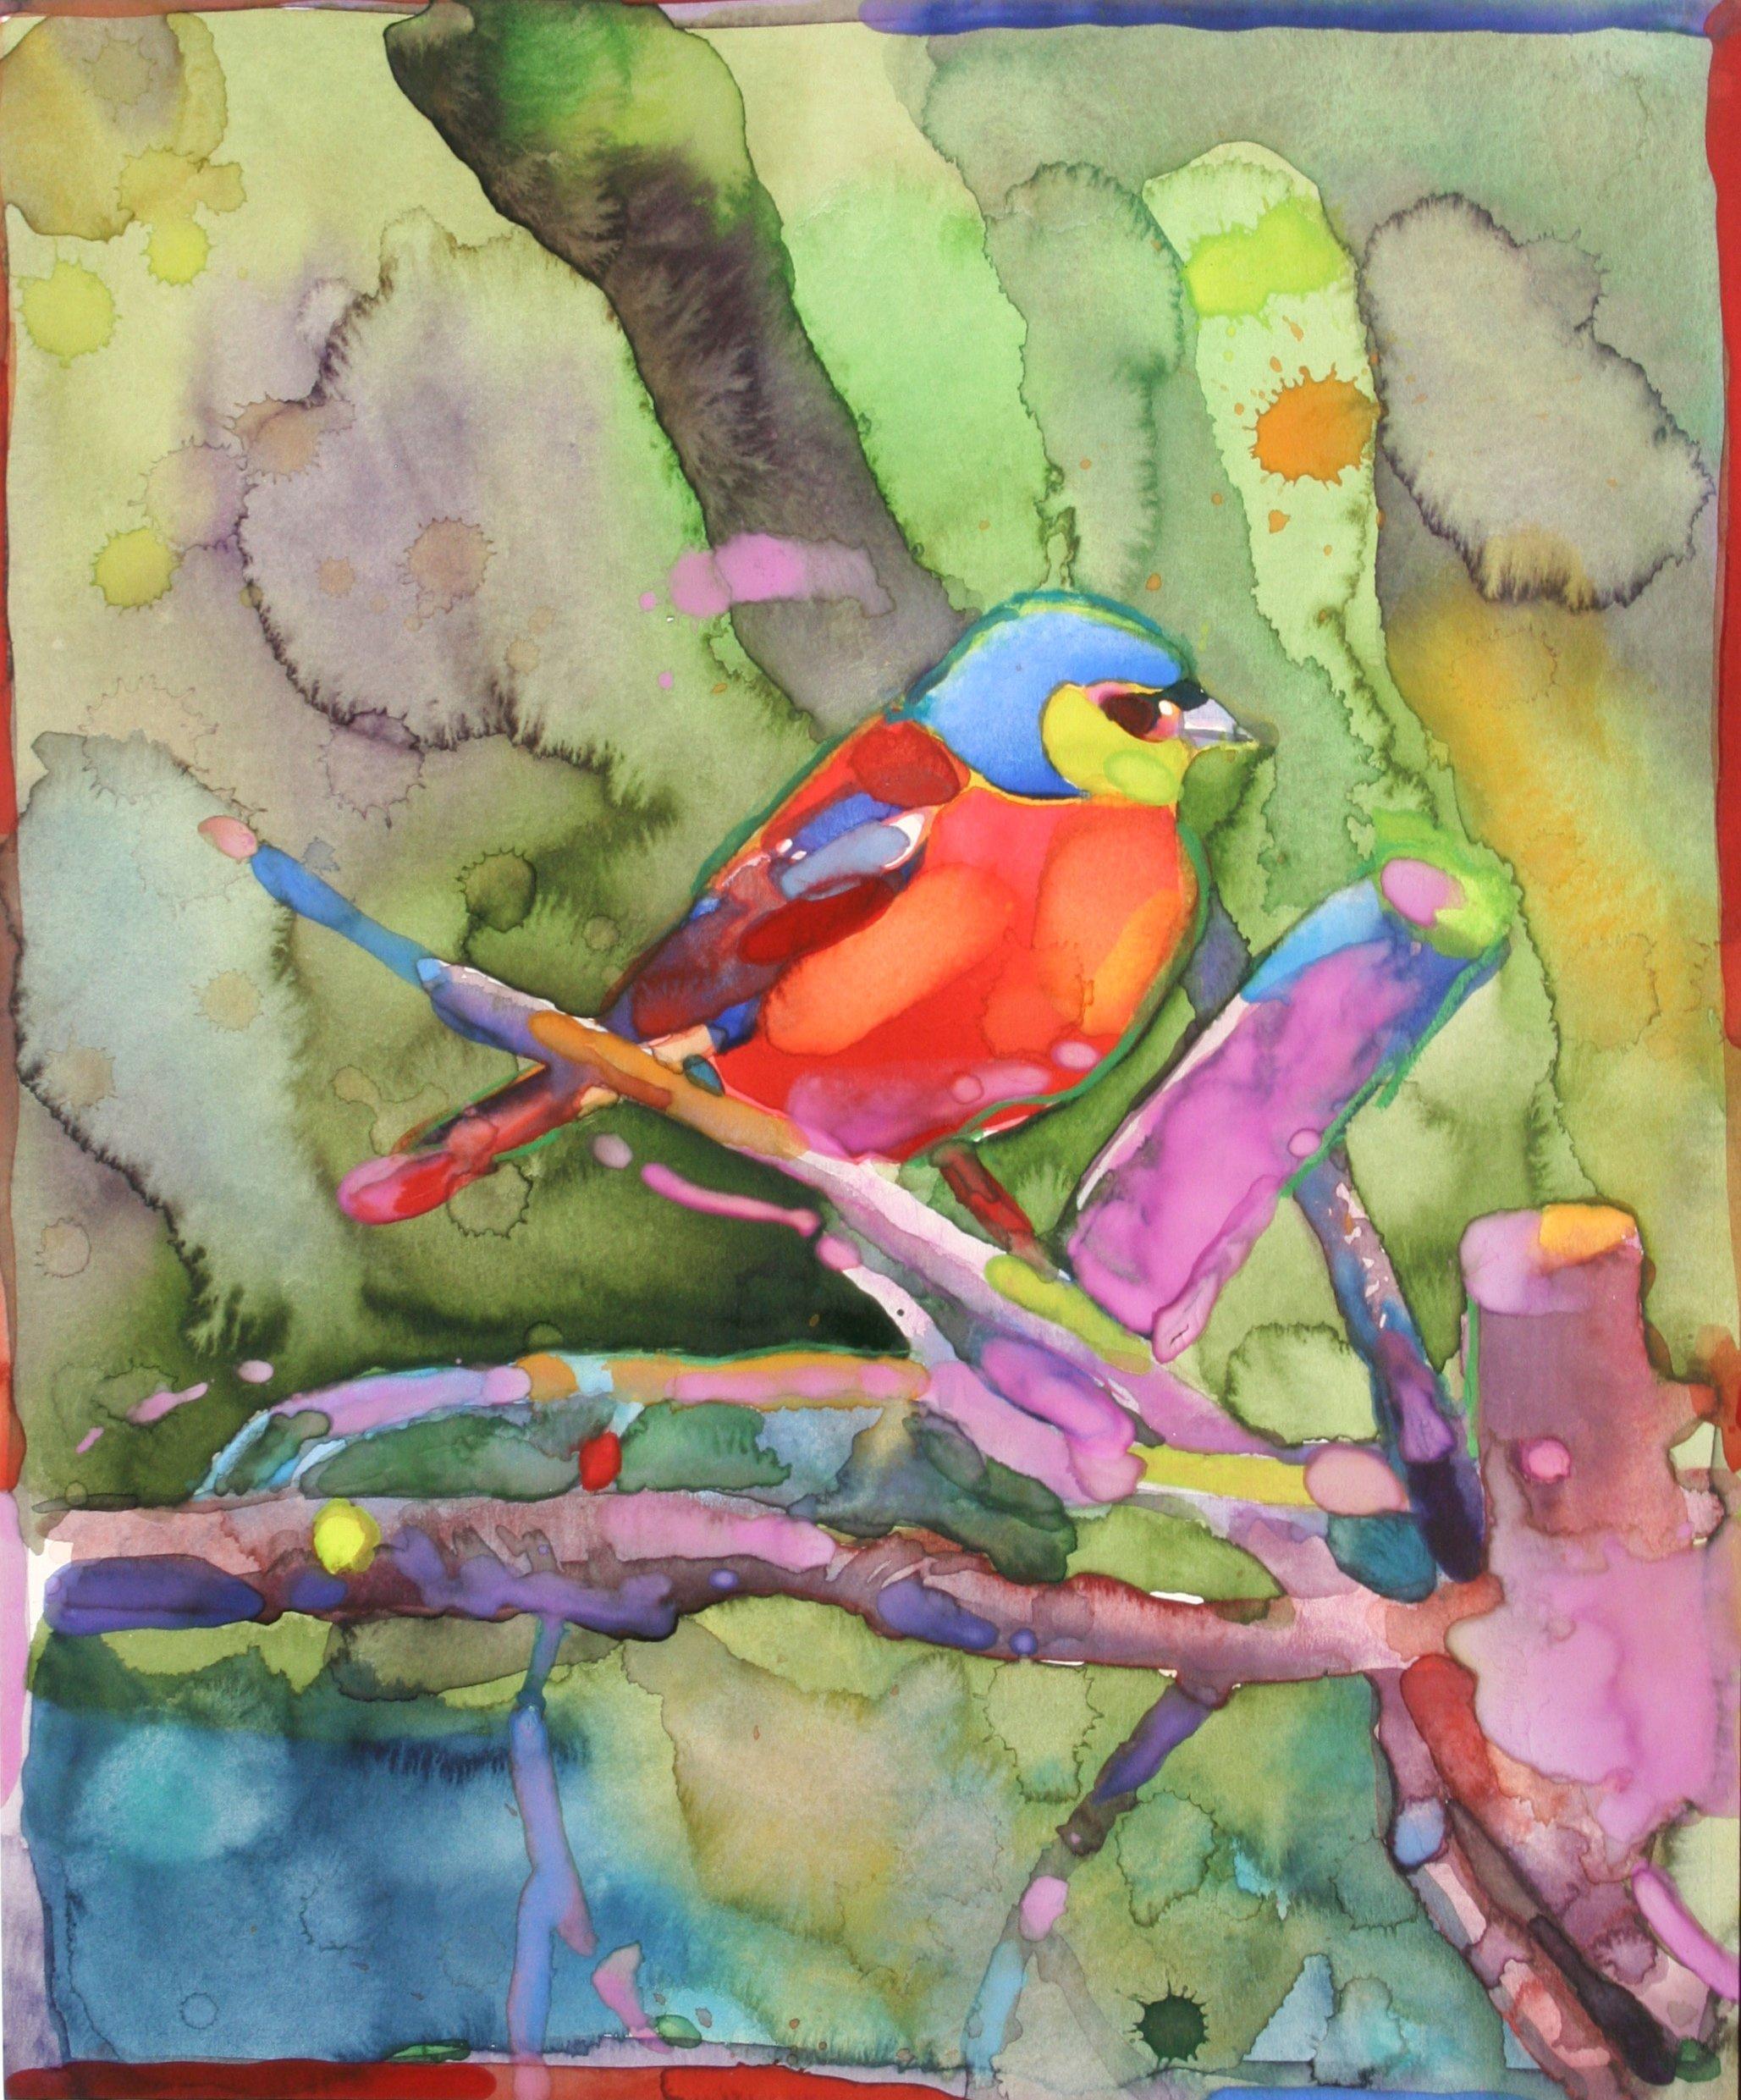 Pruner, Gary – Untitled Bird On Branch